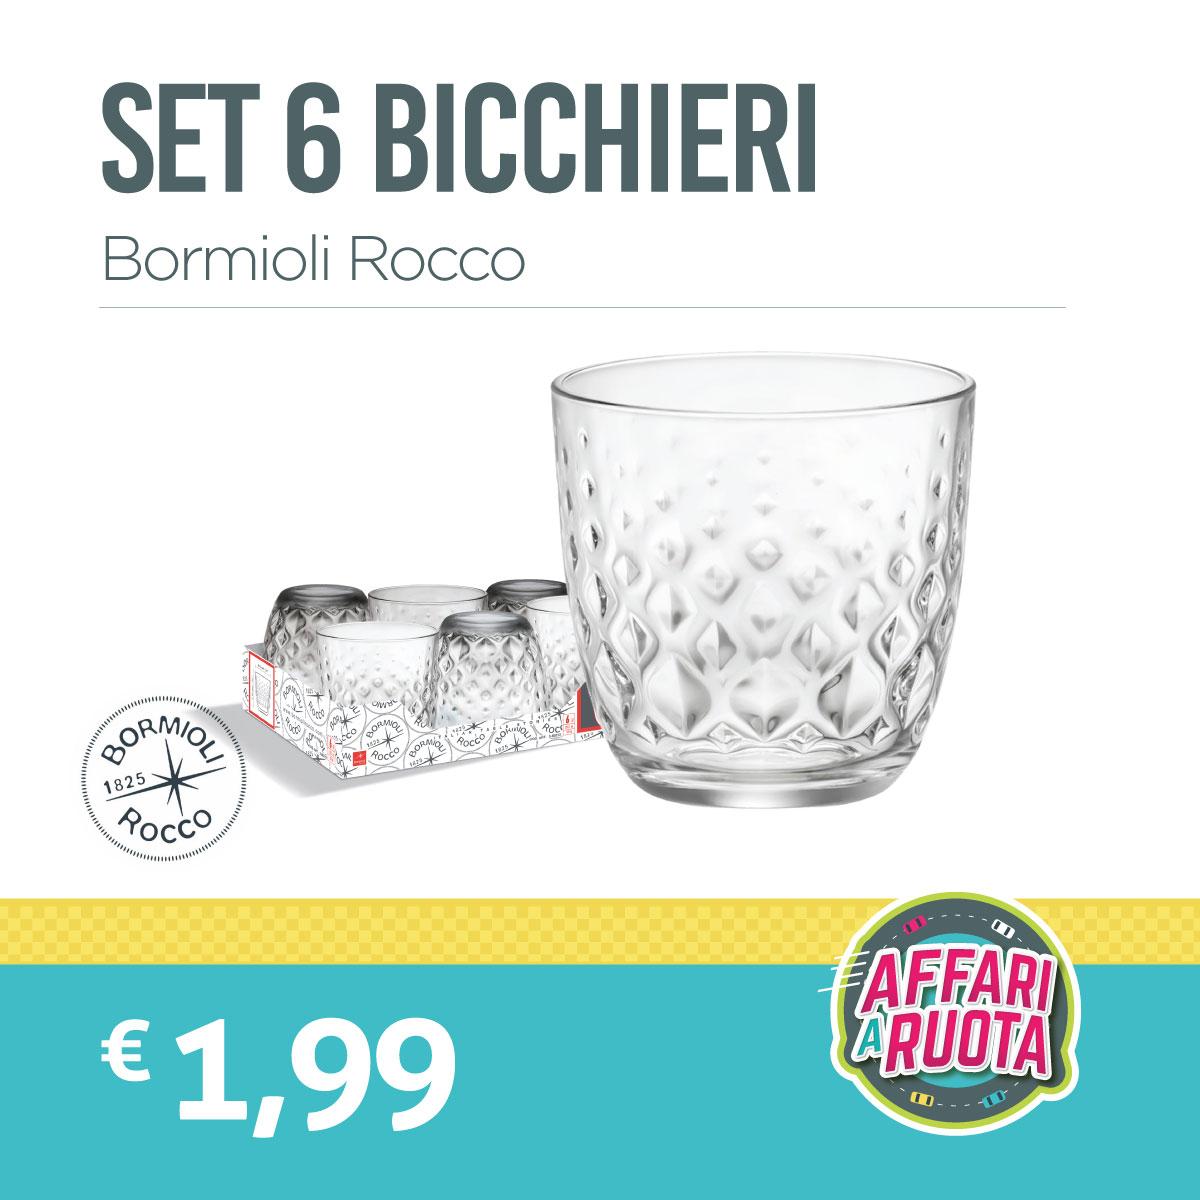 Set 6 bicchieri Bormioli Rocco